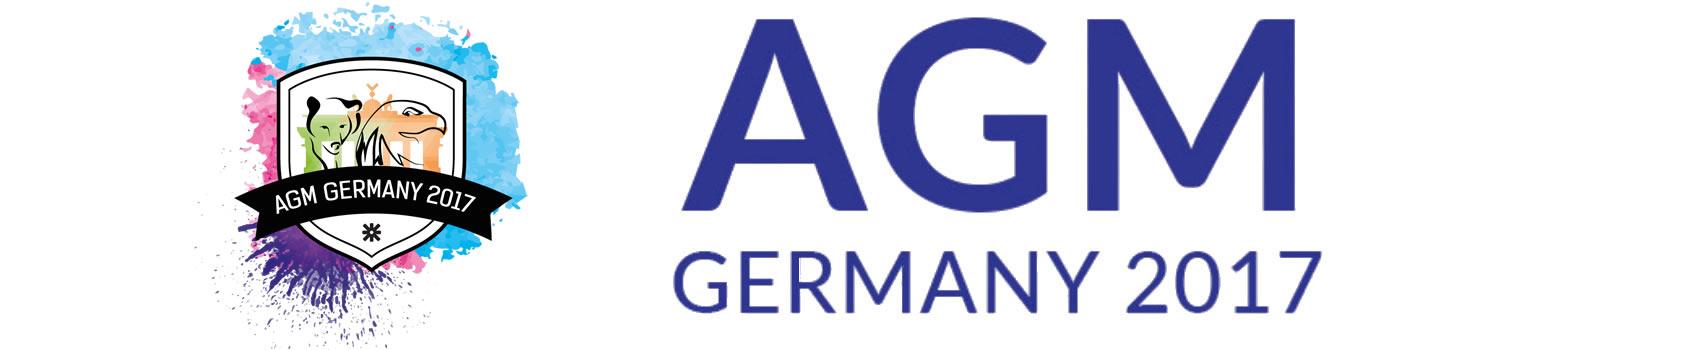 AGM - Germany